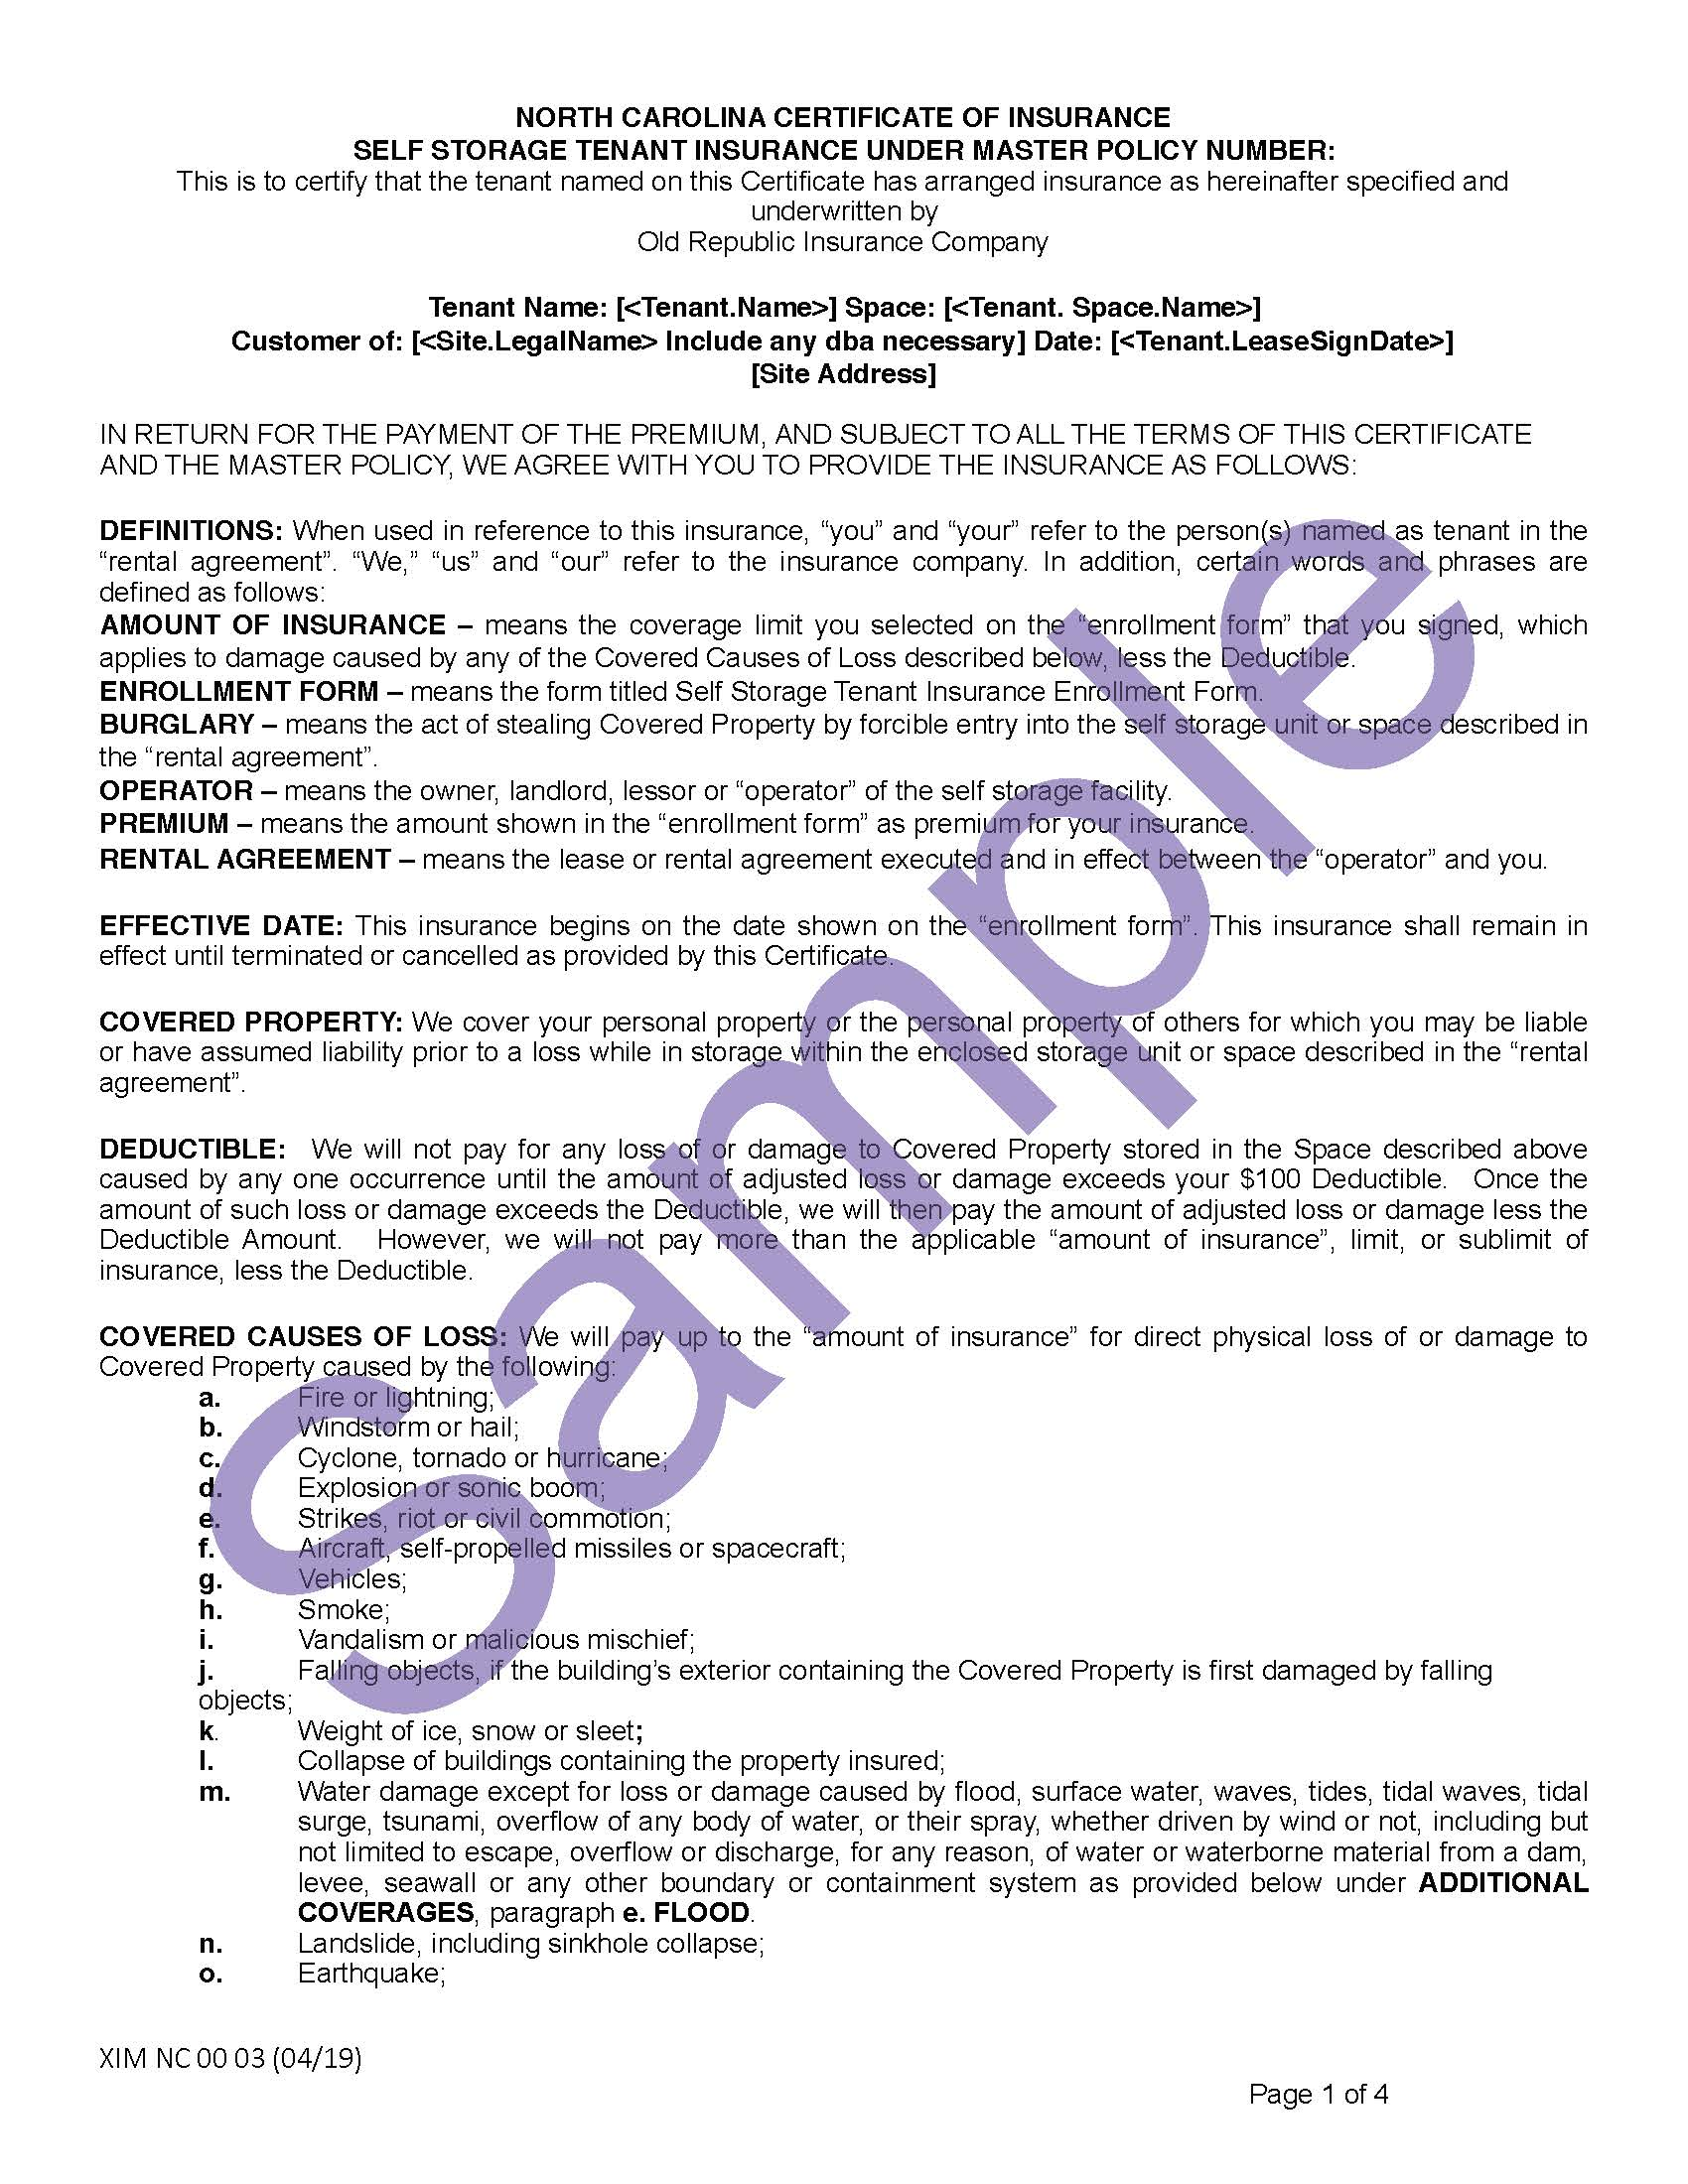 XIM NC 00 03 04 19 North Carolina Certificate of InsuranceSample_Page_1.jpg